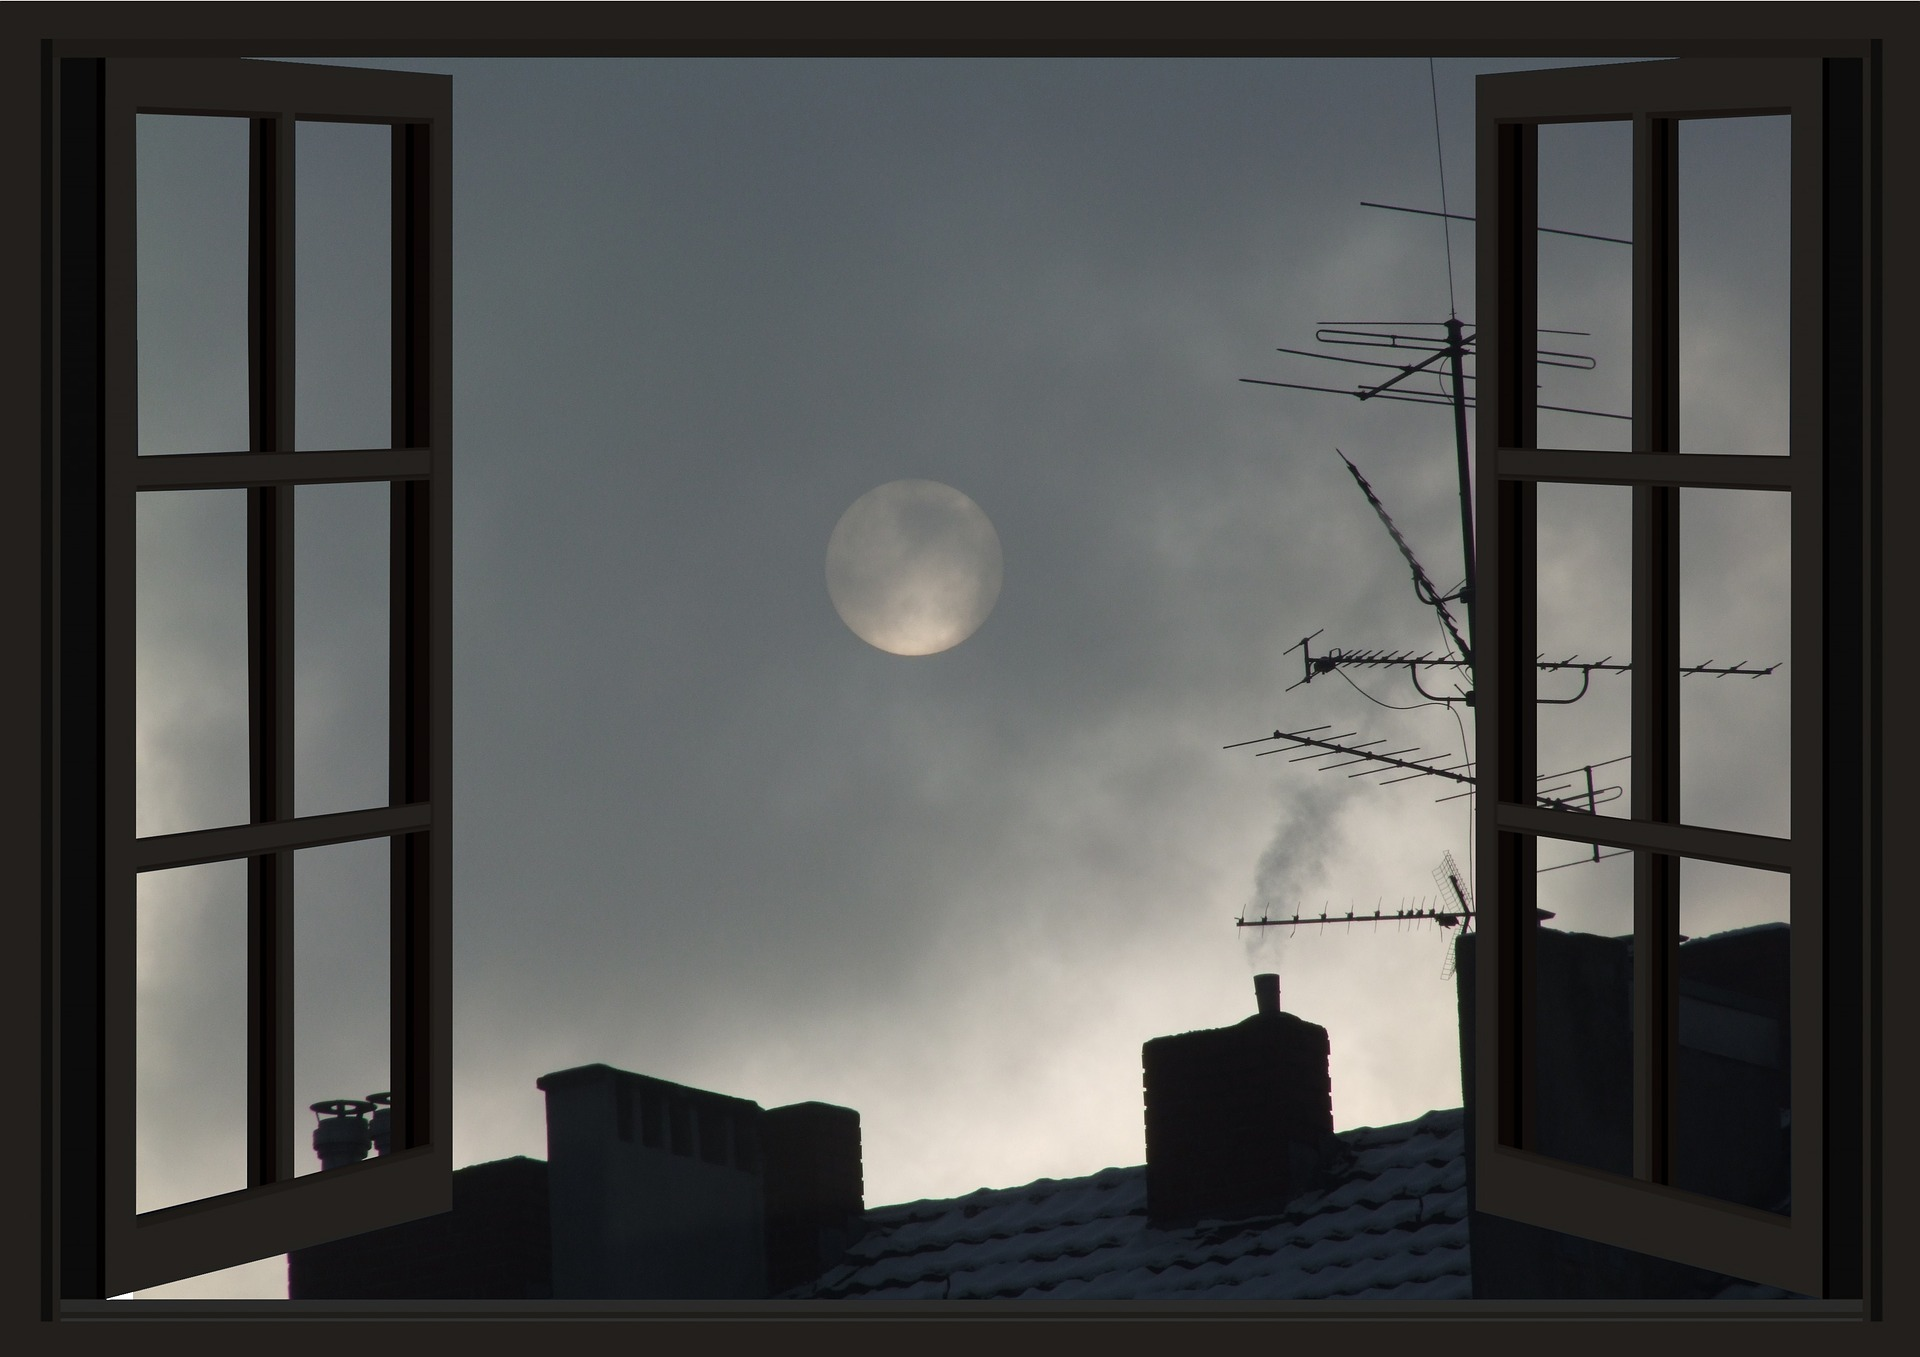 Image of moon seen through window